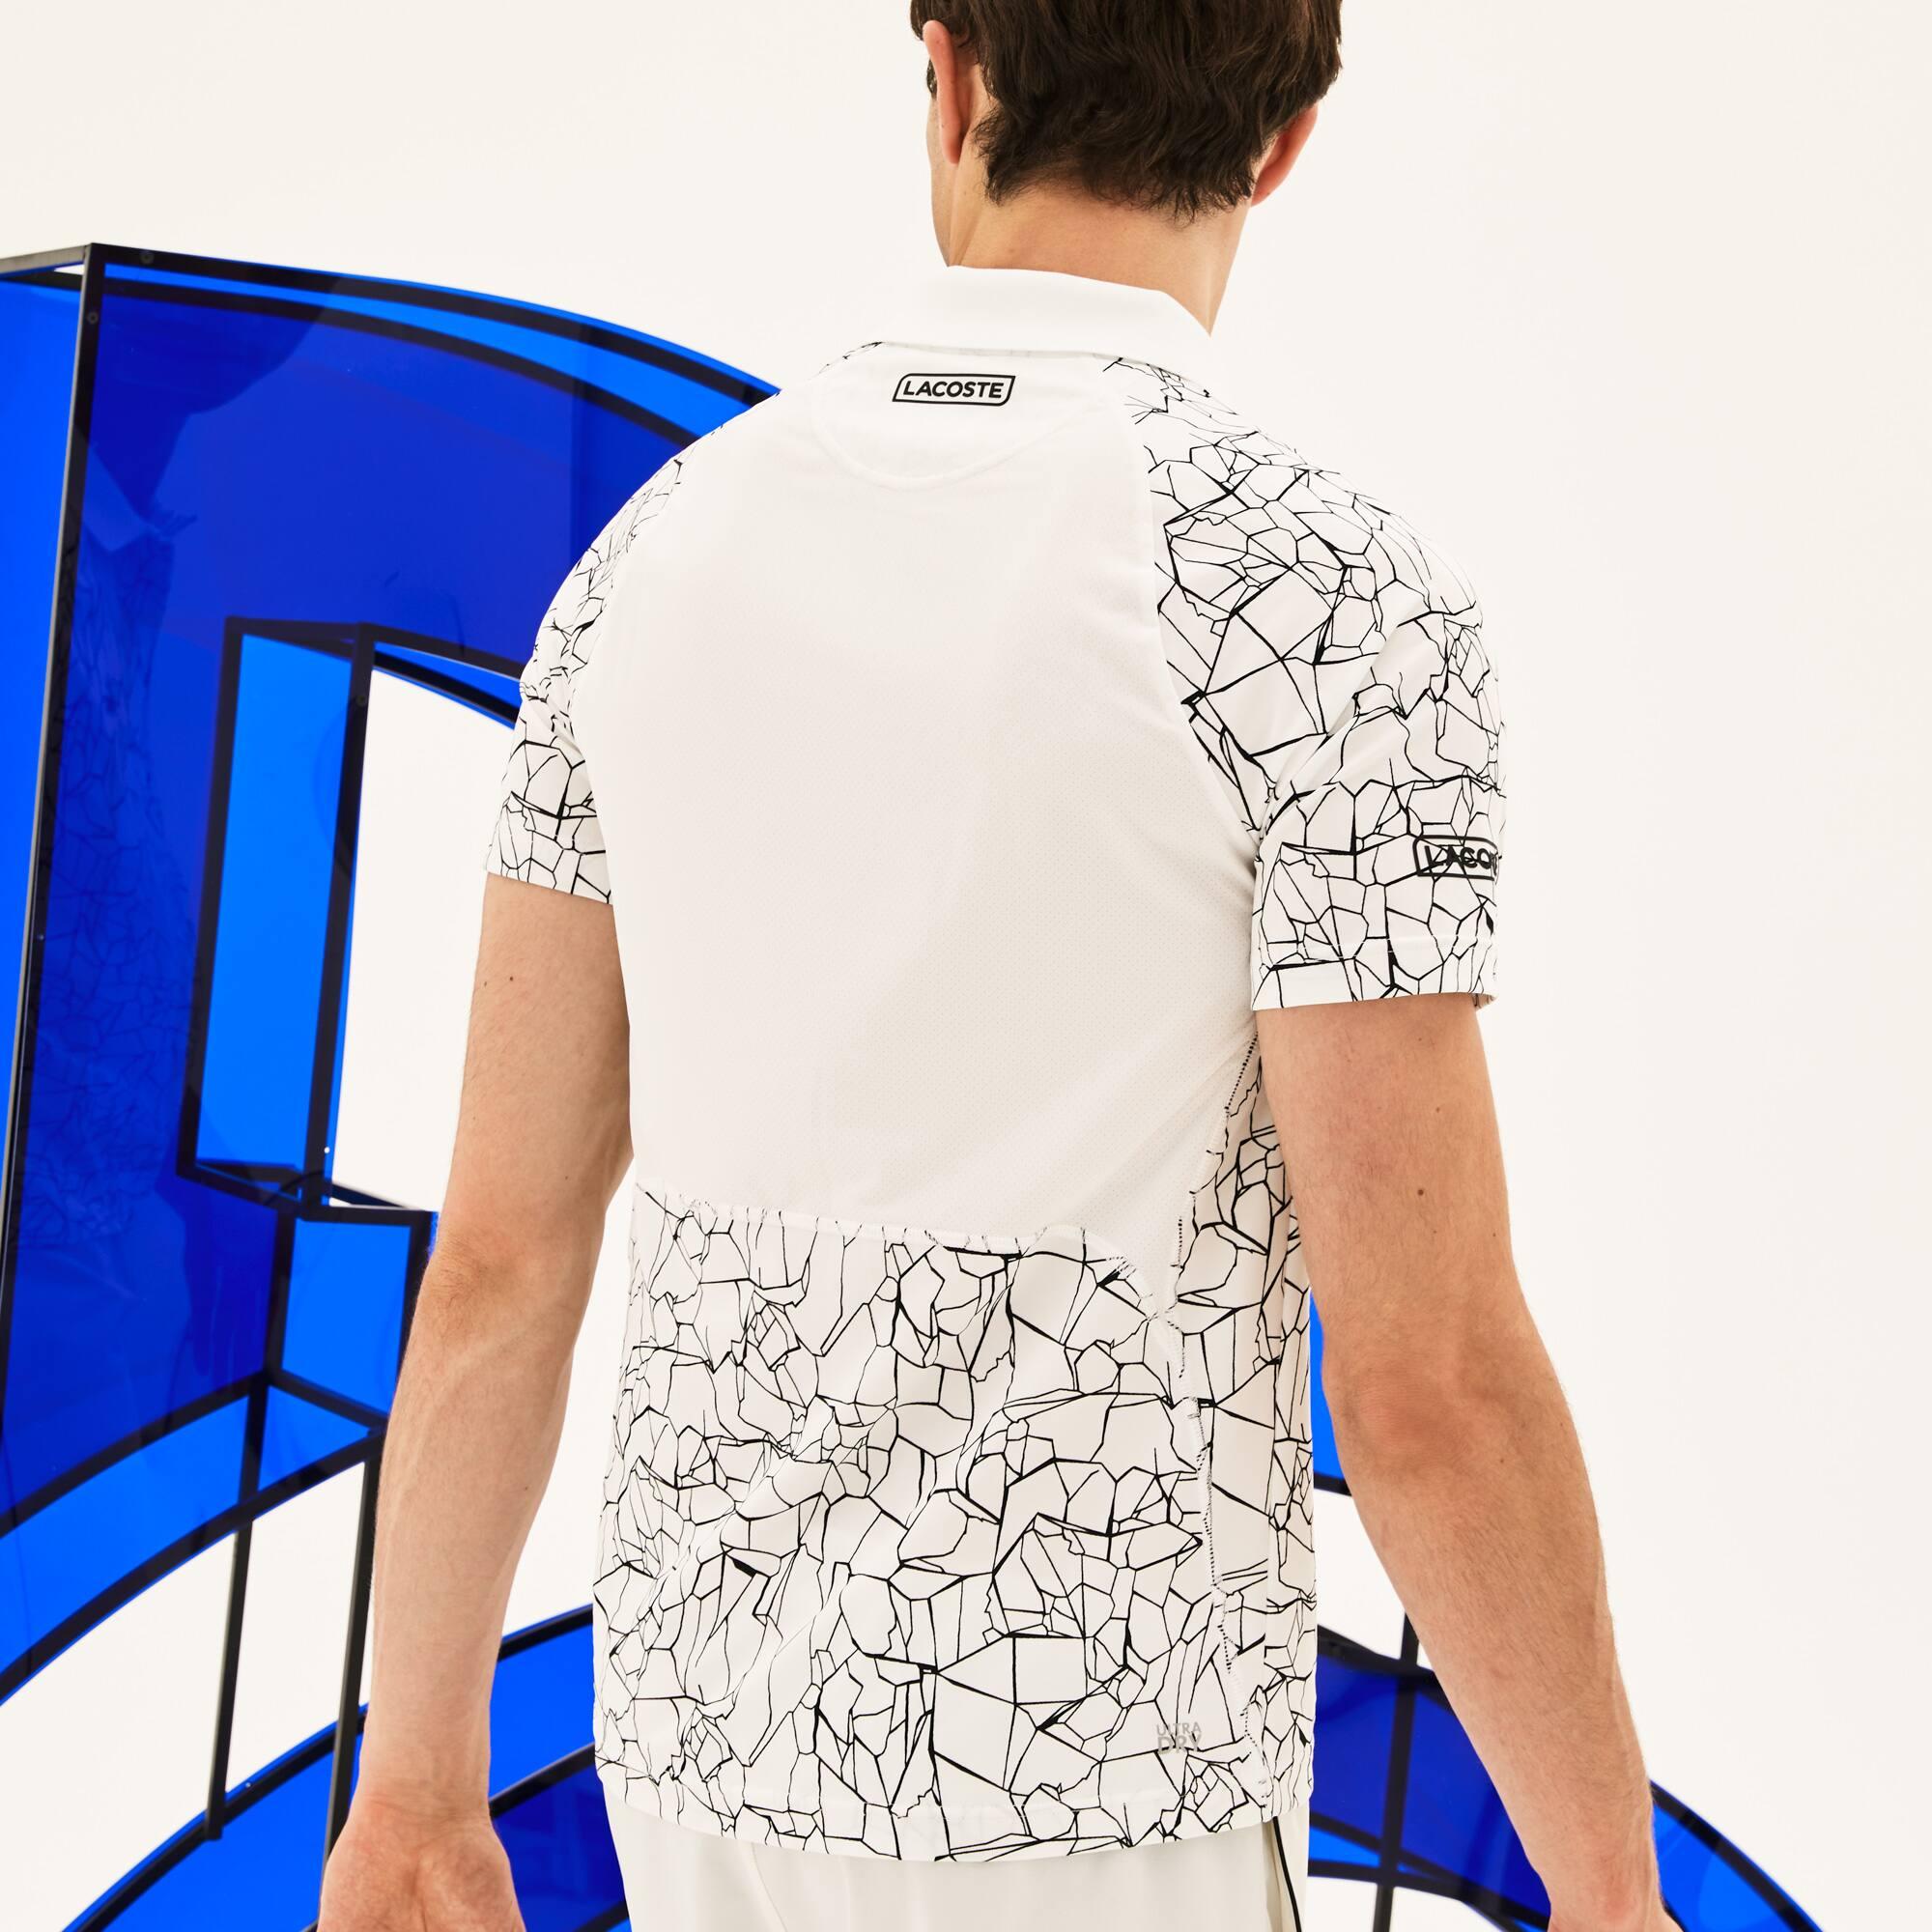 Lacoste - Polo De Hombre Lacoste SPORT Novak Djokovic-On Court Collection En Tejido De Punto Técnico Estampado - 2